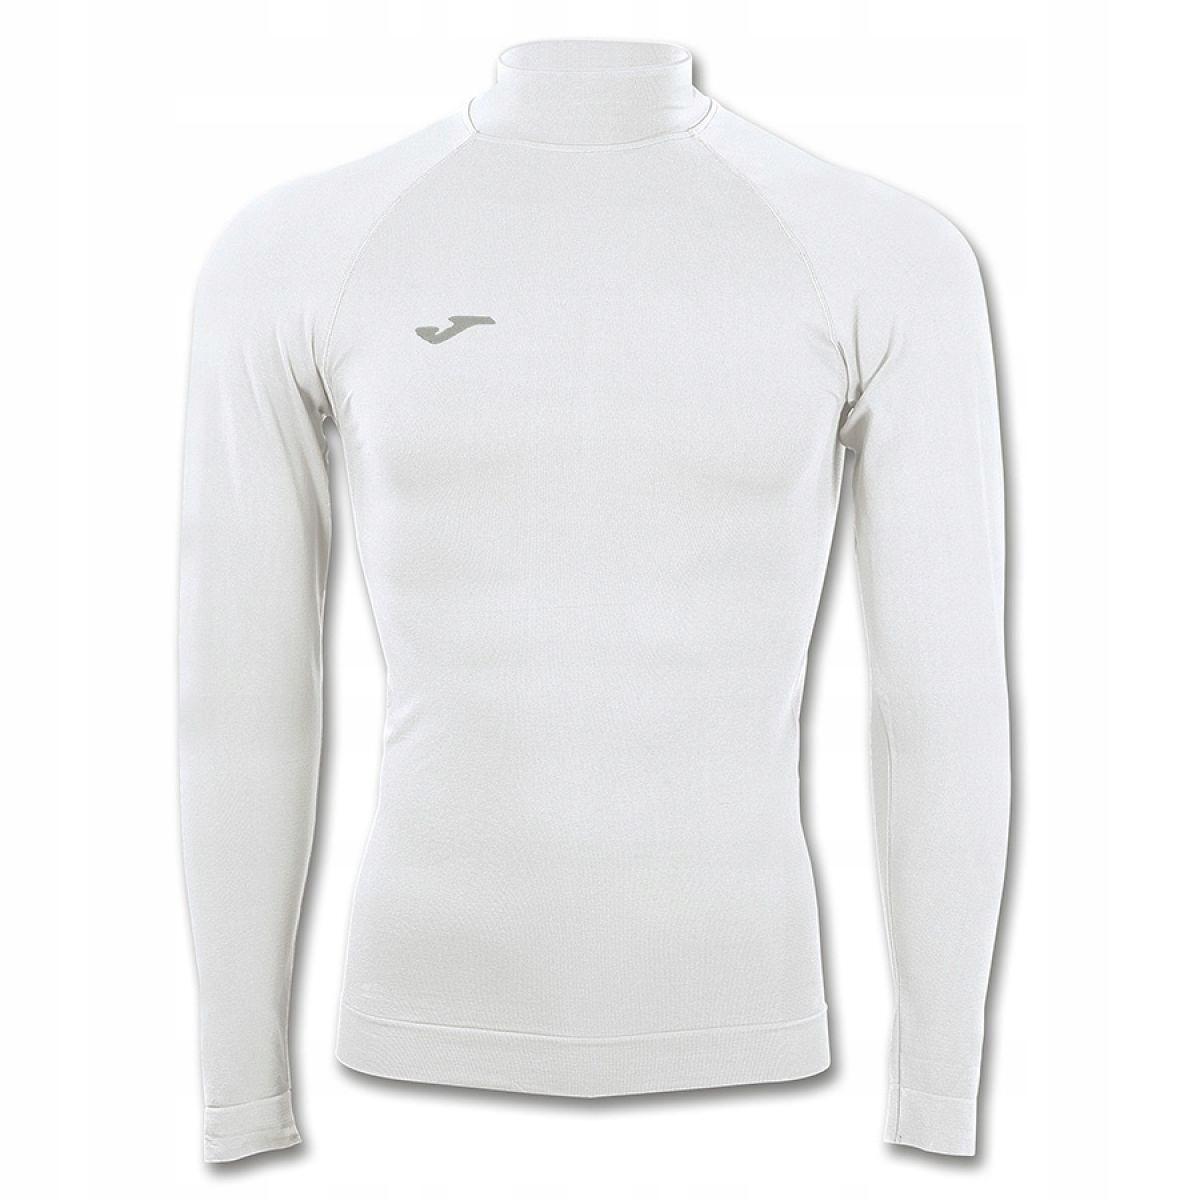 Koszulka Joma Brama Classic 3477.55.100S L/XL